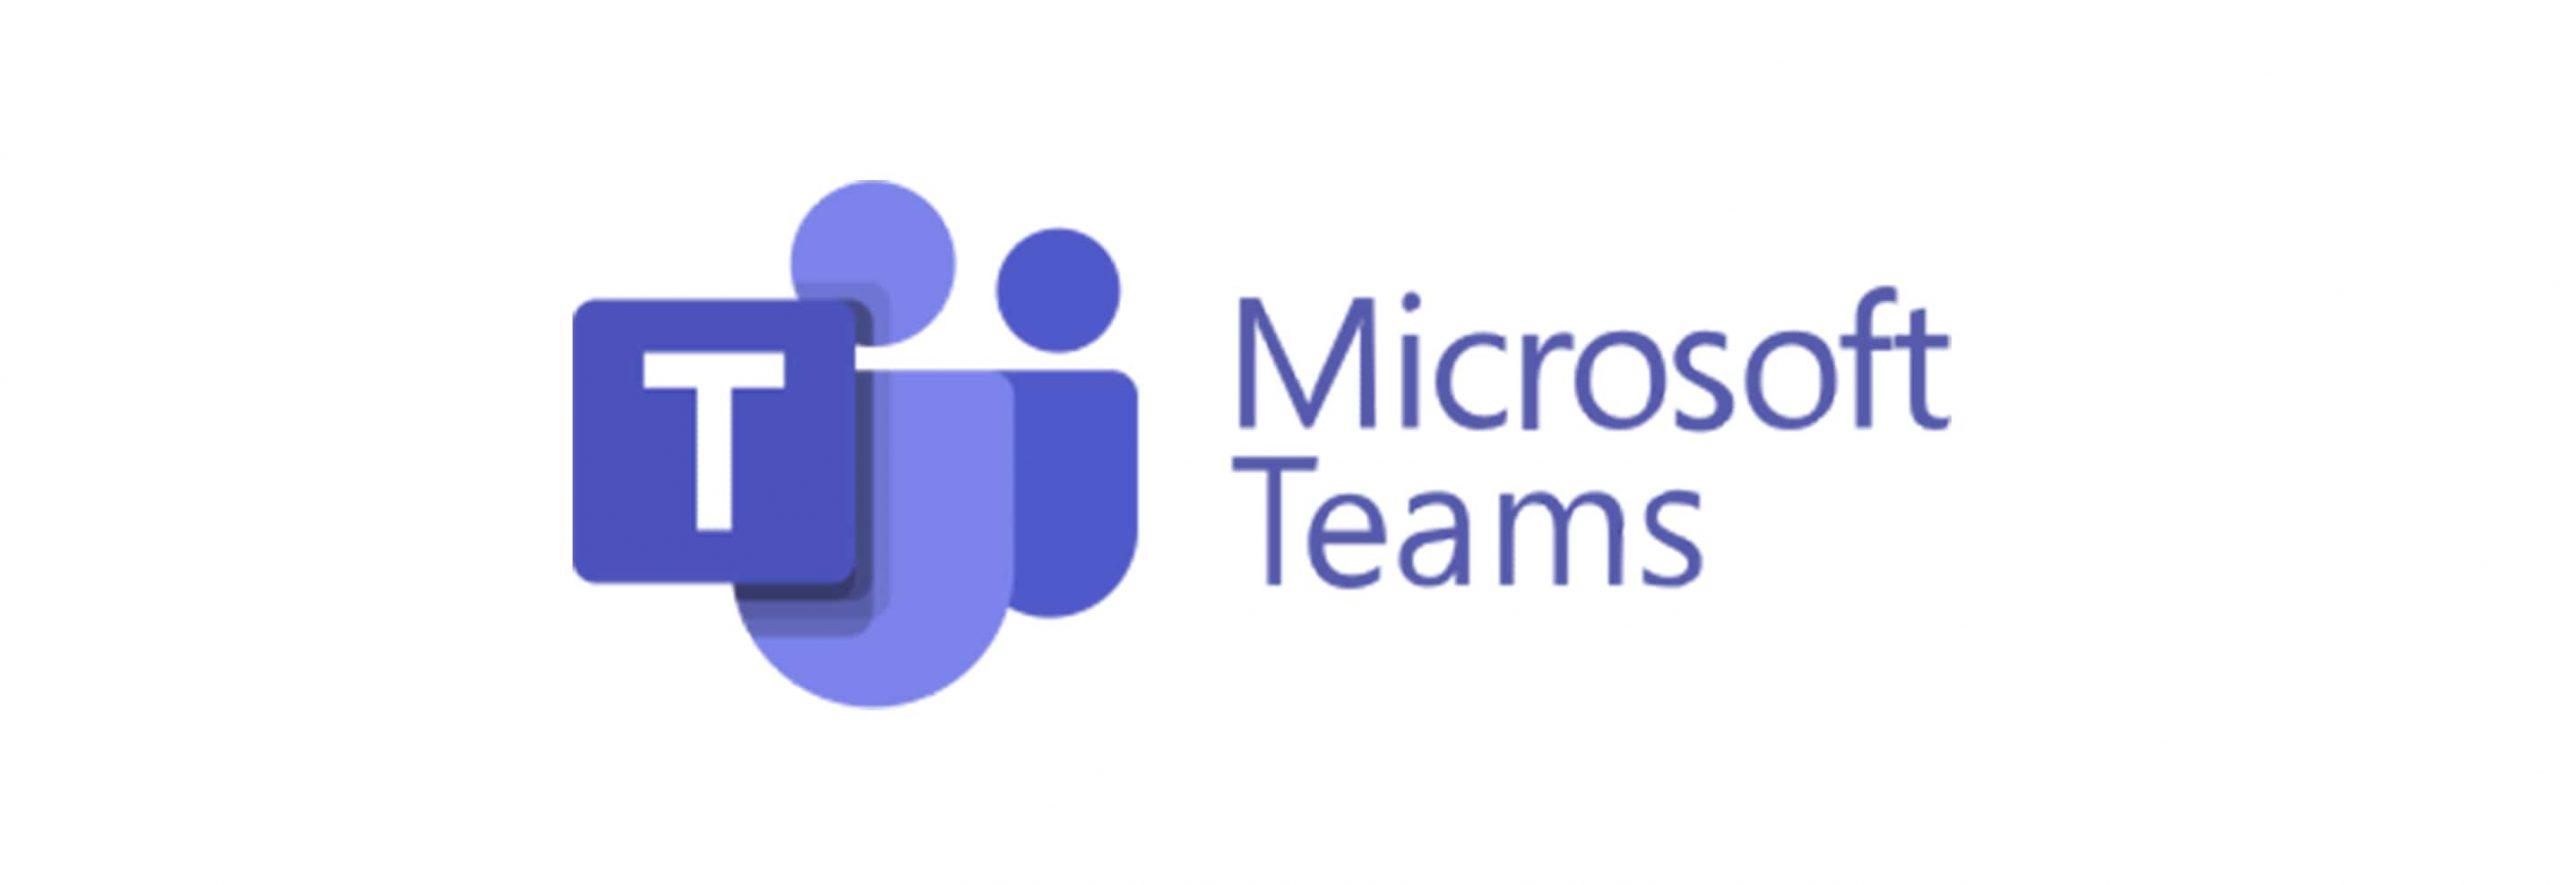 microsoft teams-min